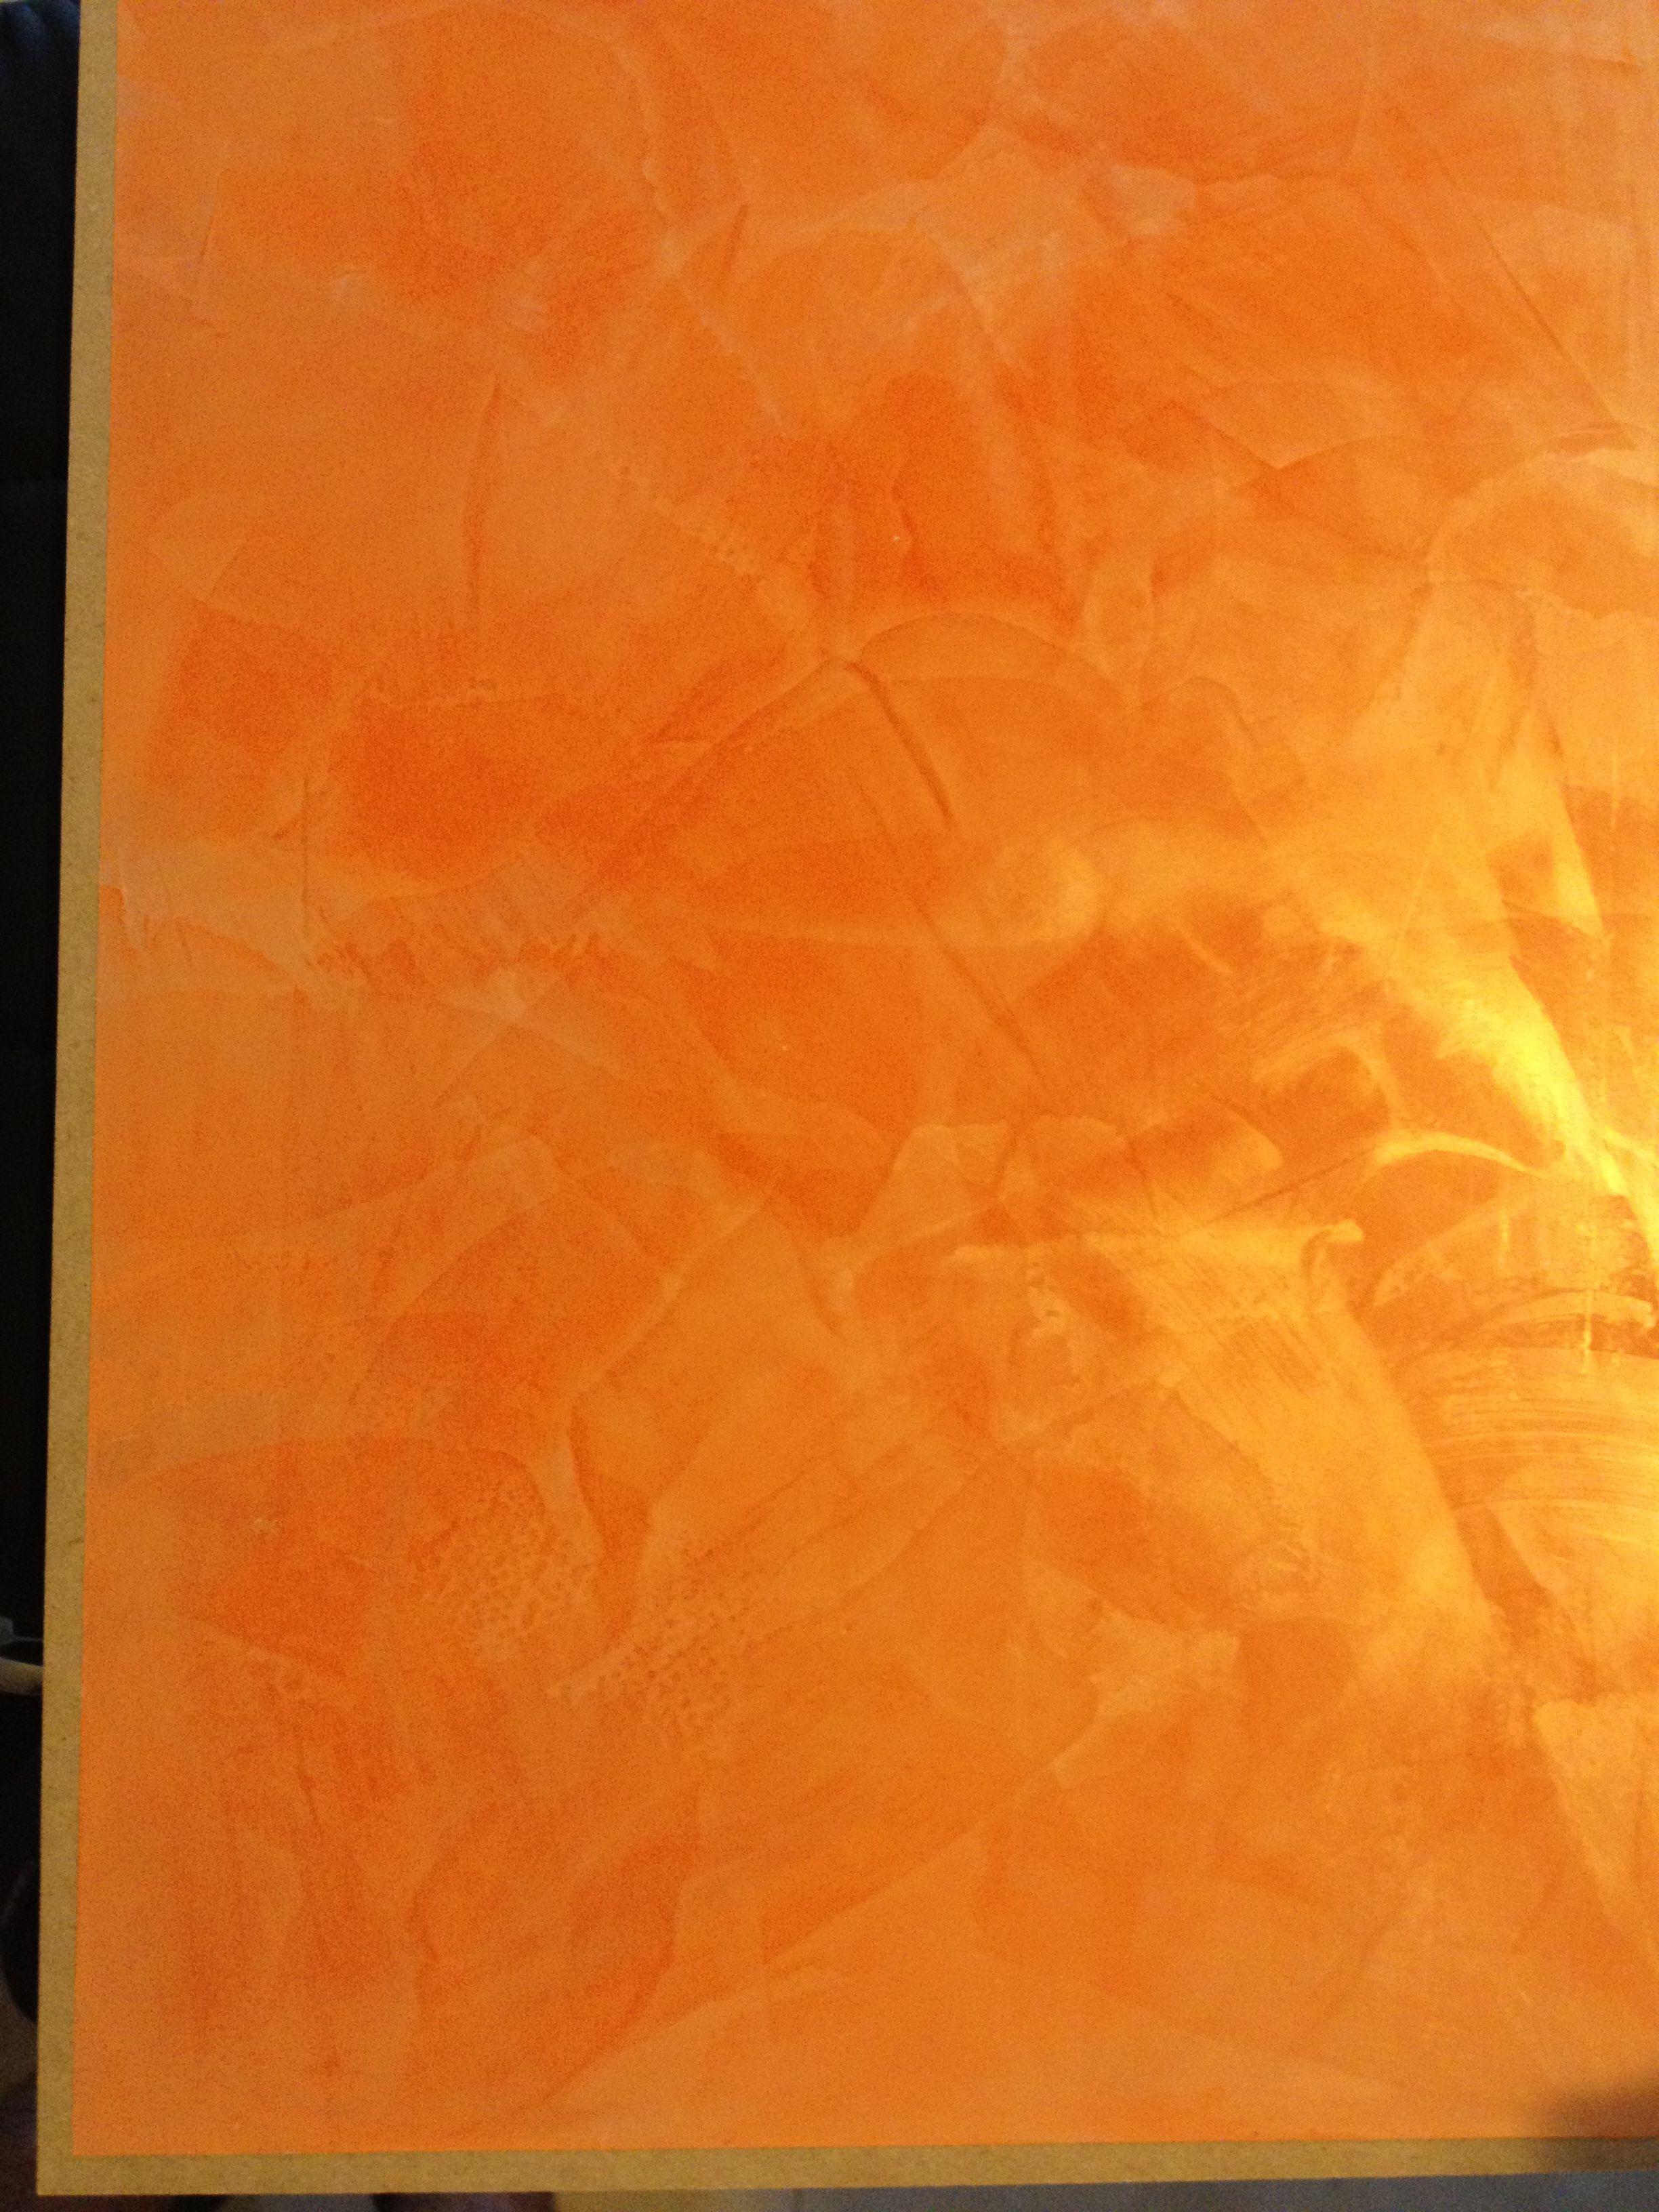 Venetian Plaster And Other Modern Plaster Walls: Gold Wax On Orange Venetian Plaster